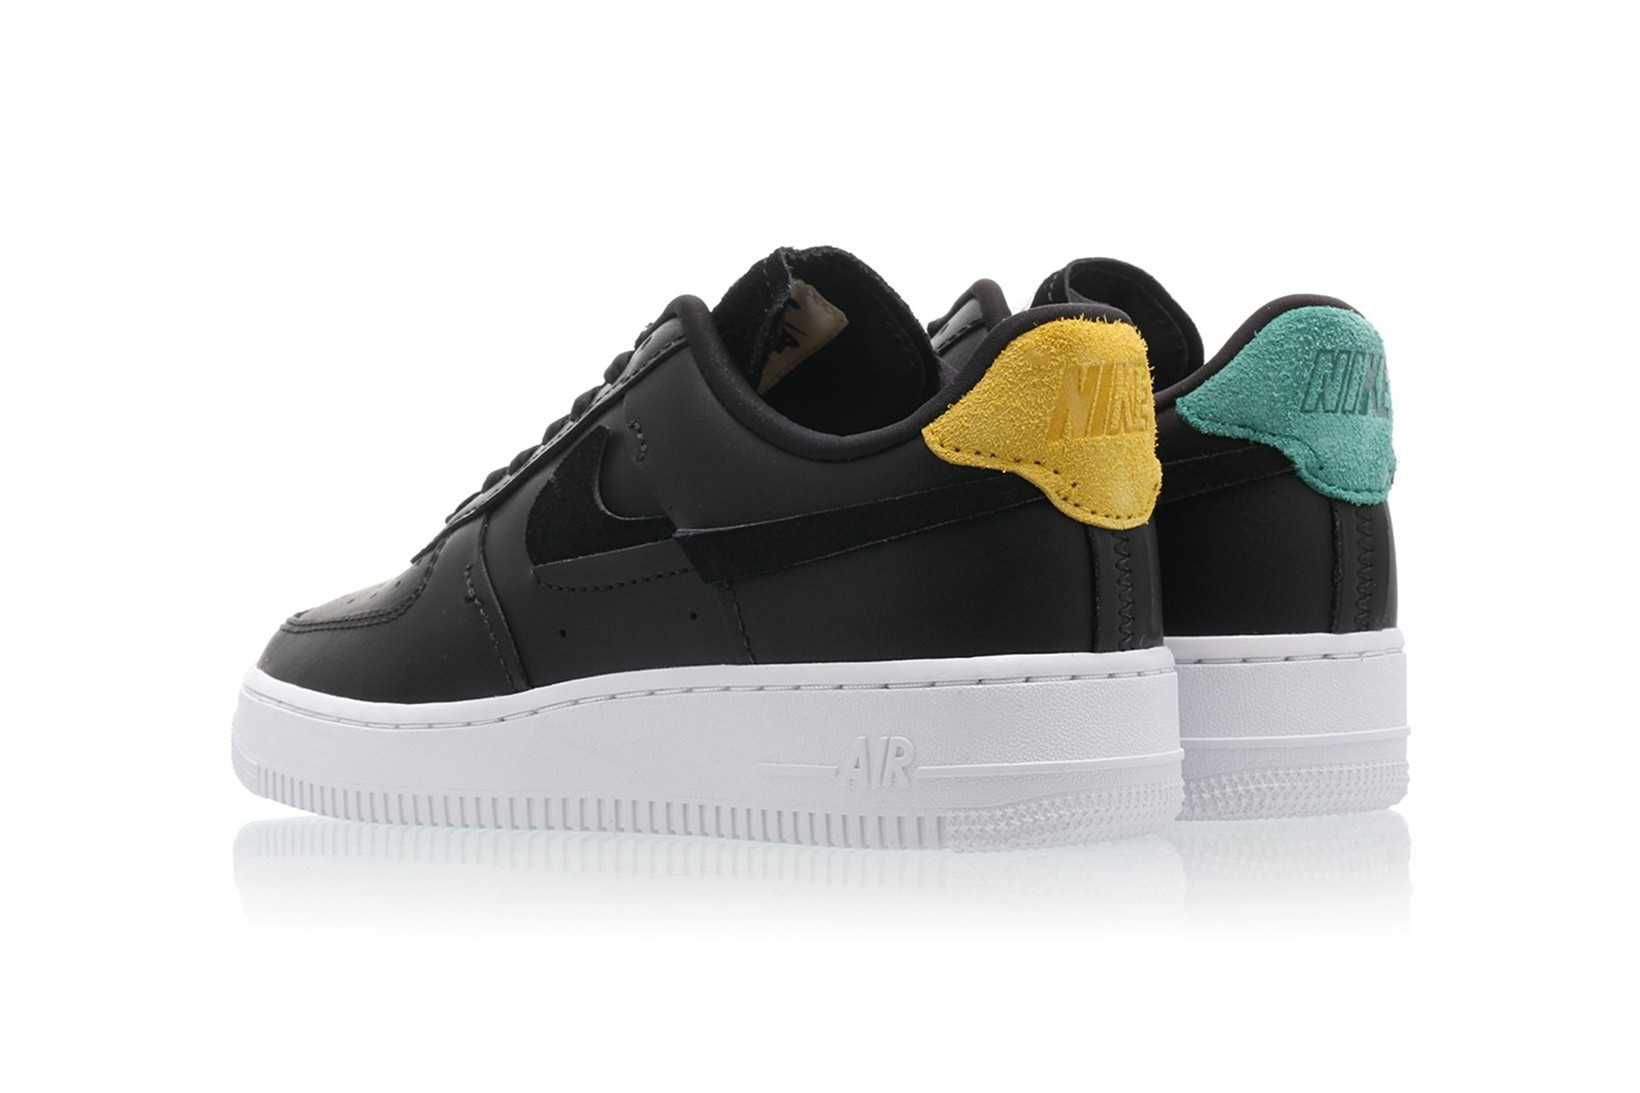 Nike's Air Force 1 '07 Vandalized